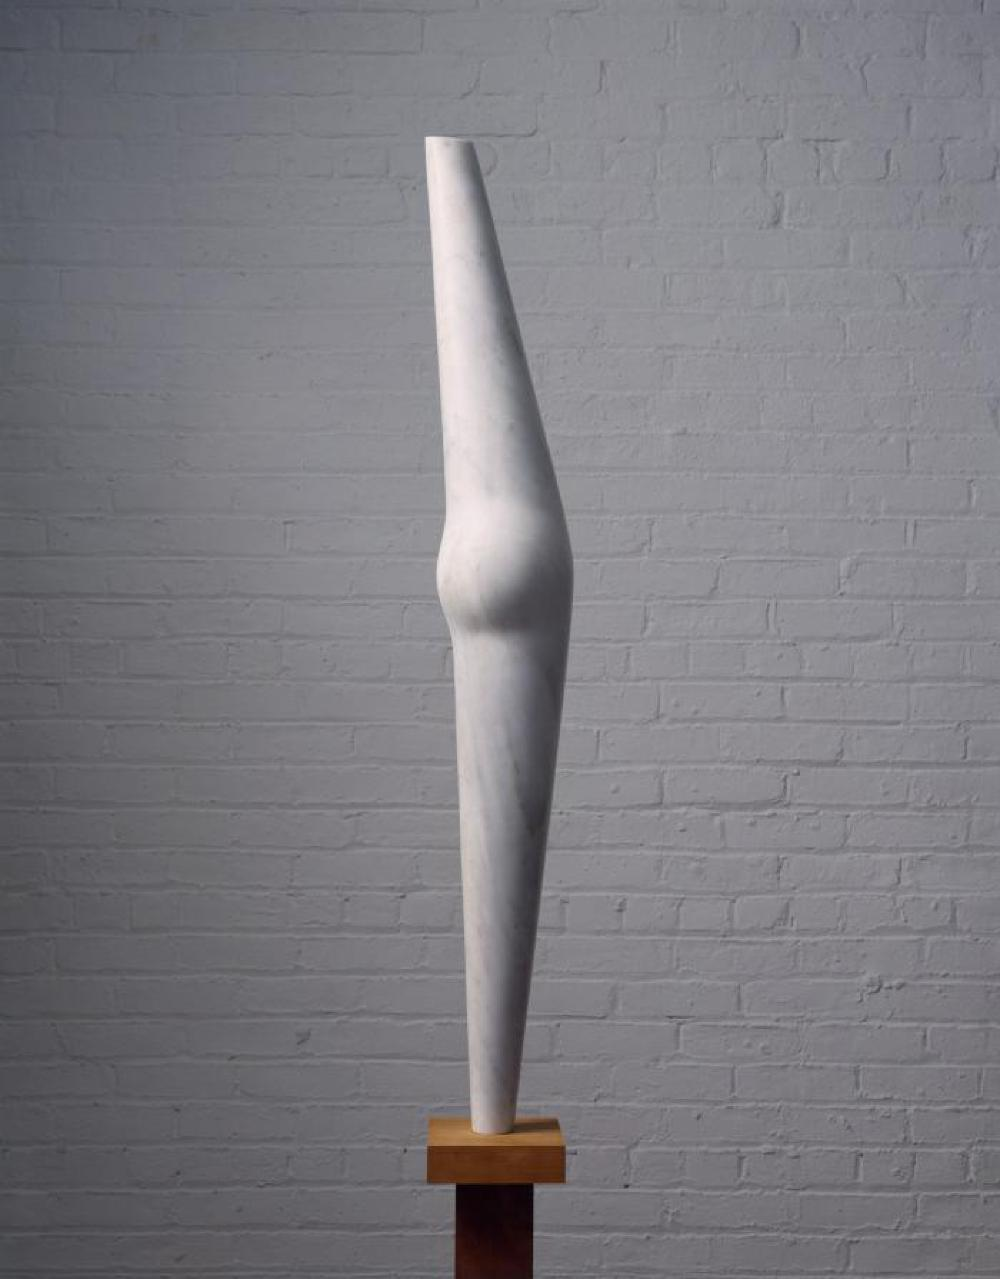 Pregnant Bird, image 1